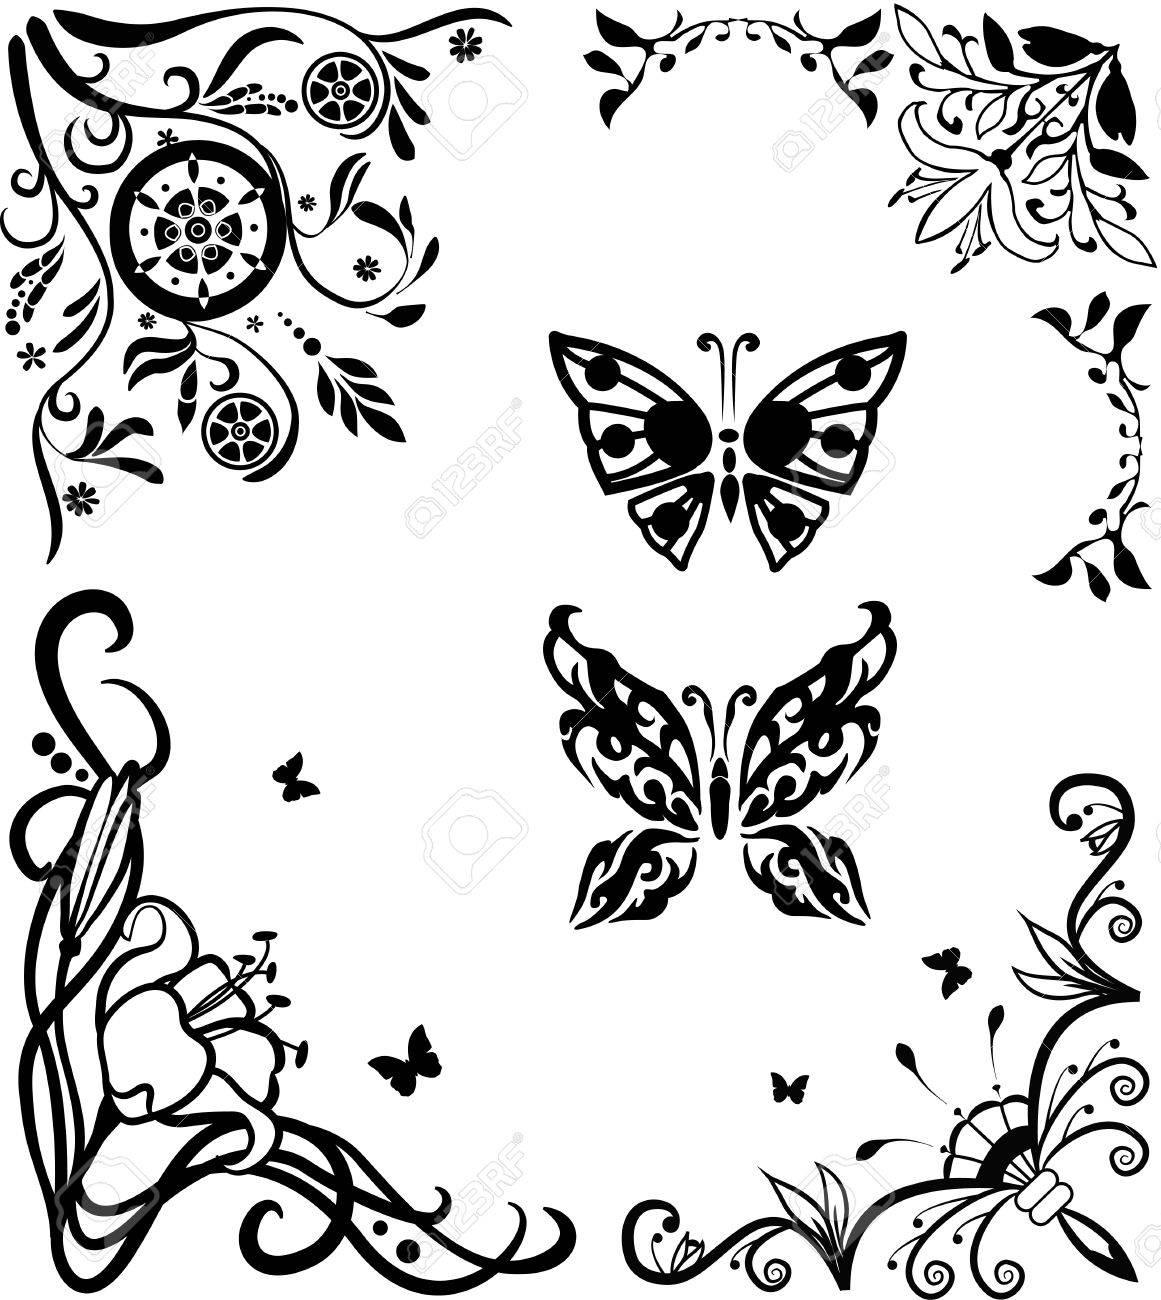 Corner doodle graseful set with butterflies for design Stock Vector - 9639220